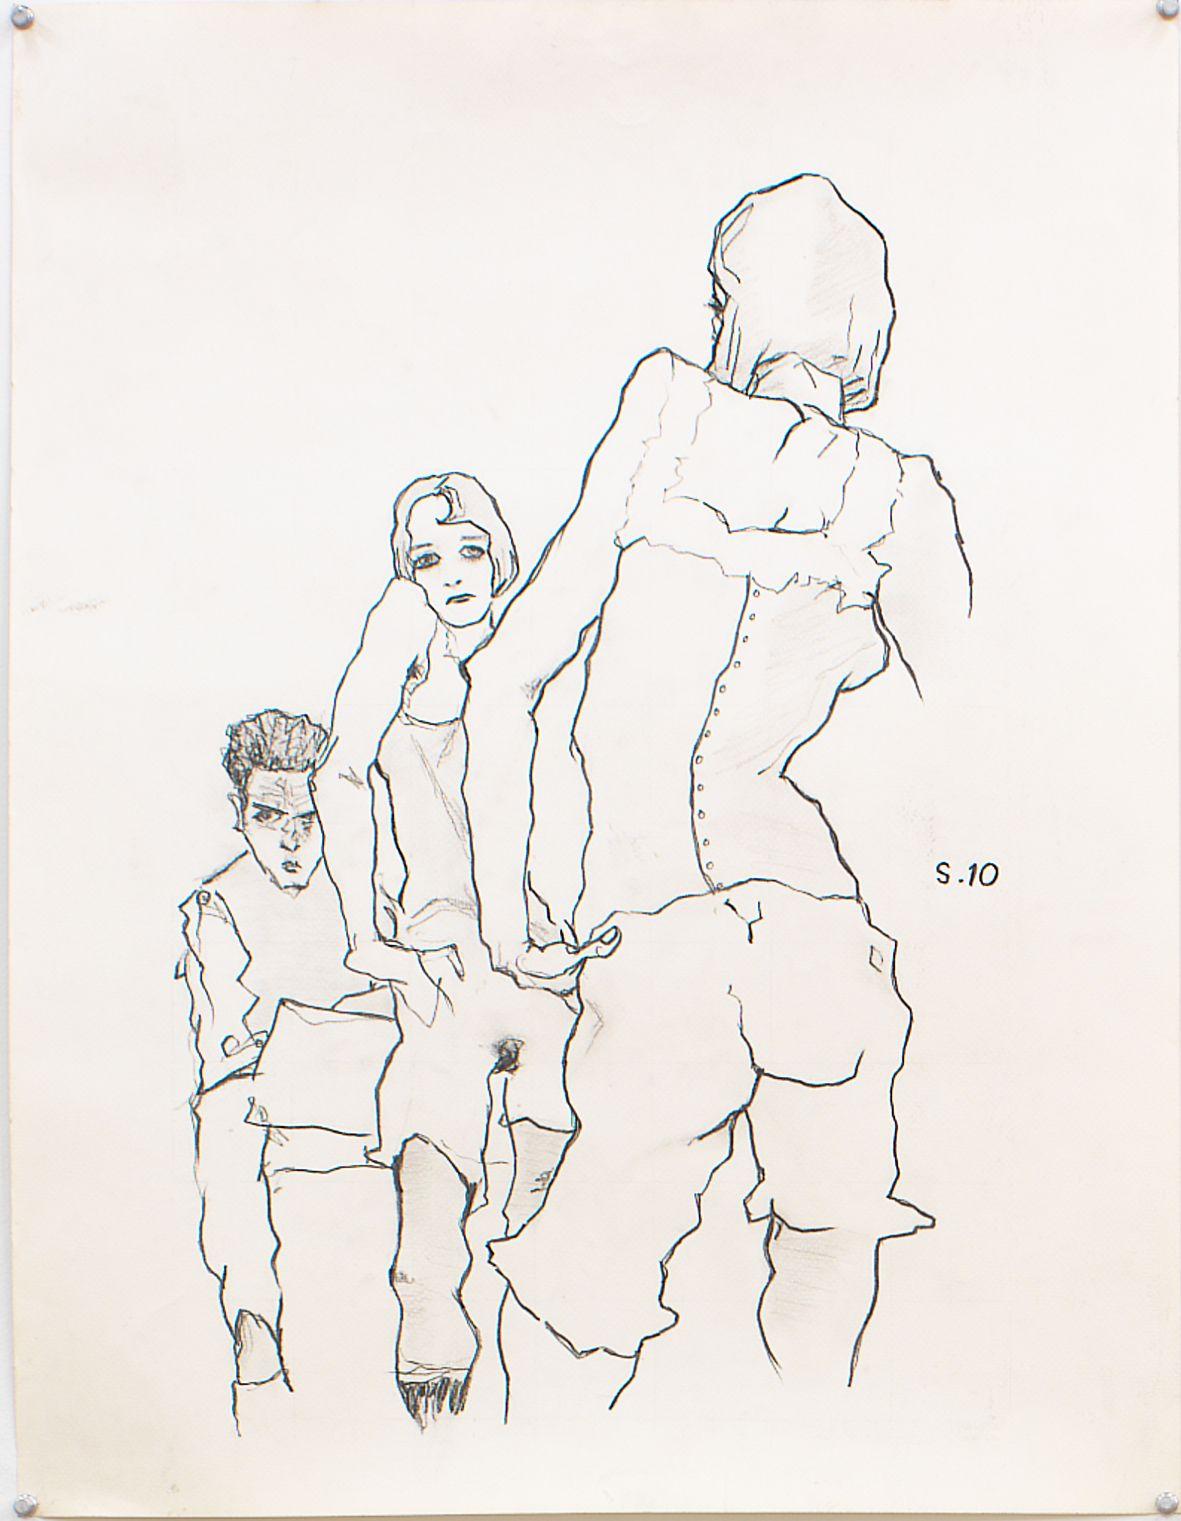 Self Portrait after Egon Schiele for Animation, 1995, Graphite on paper